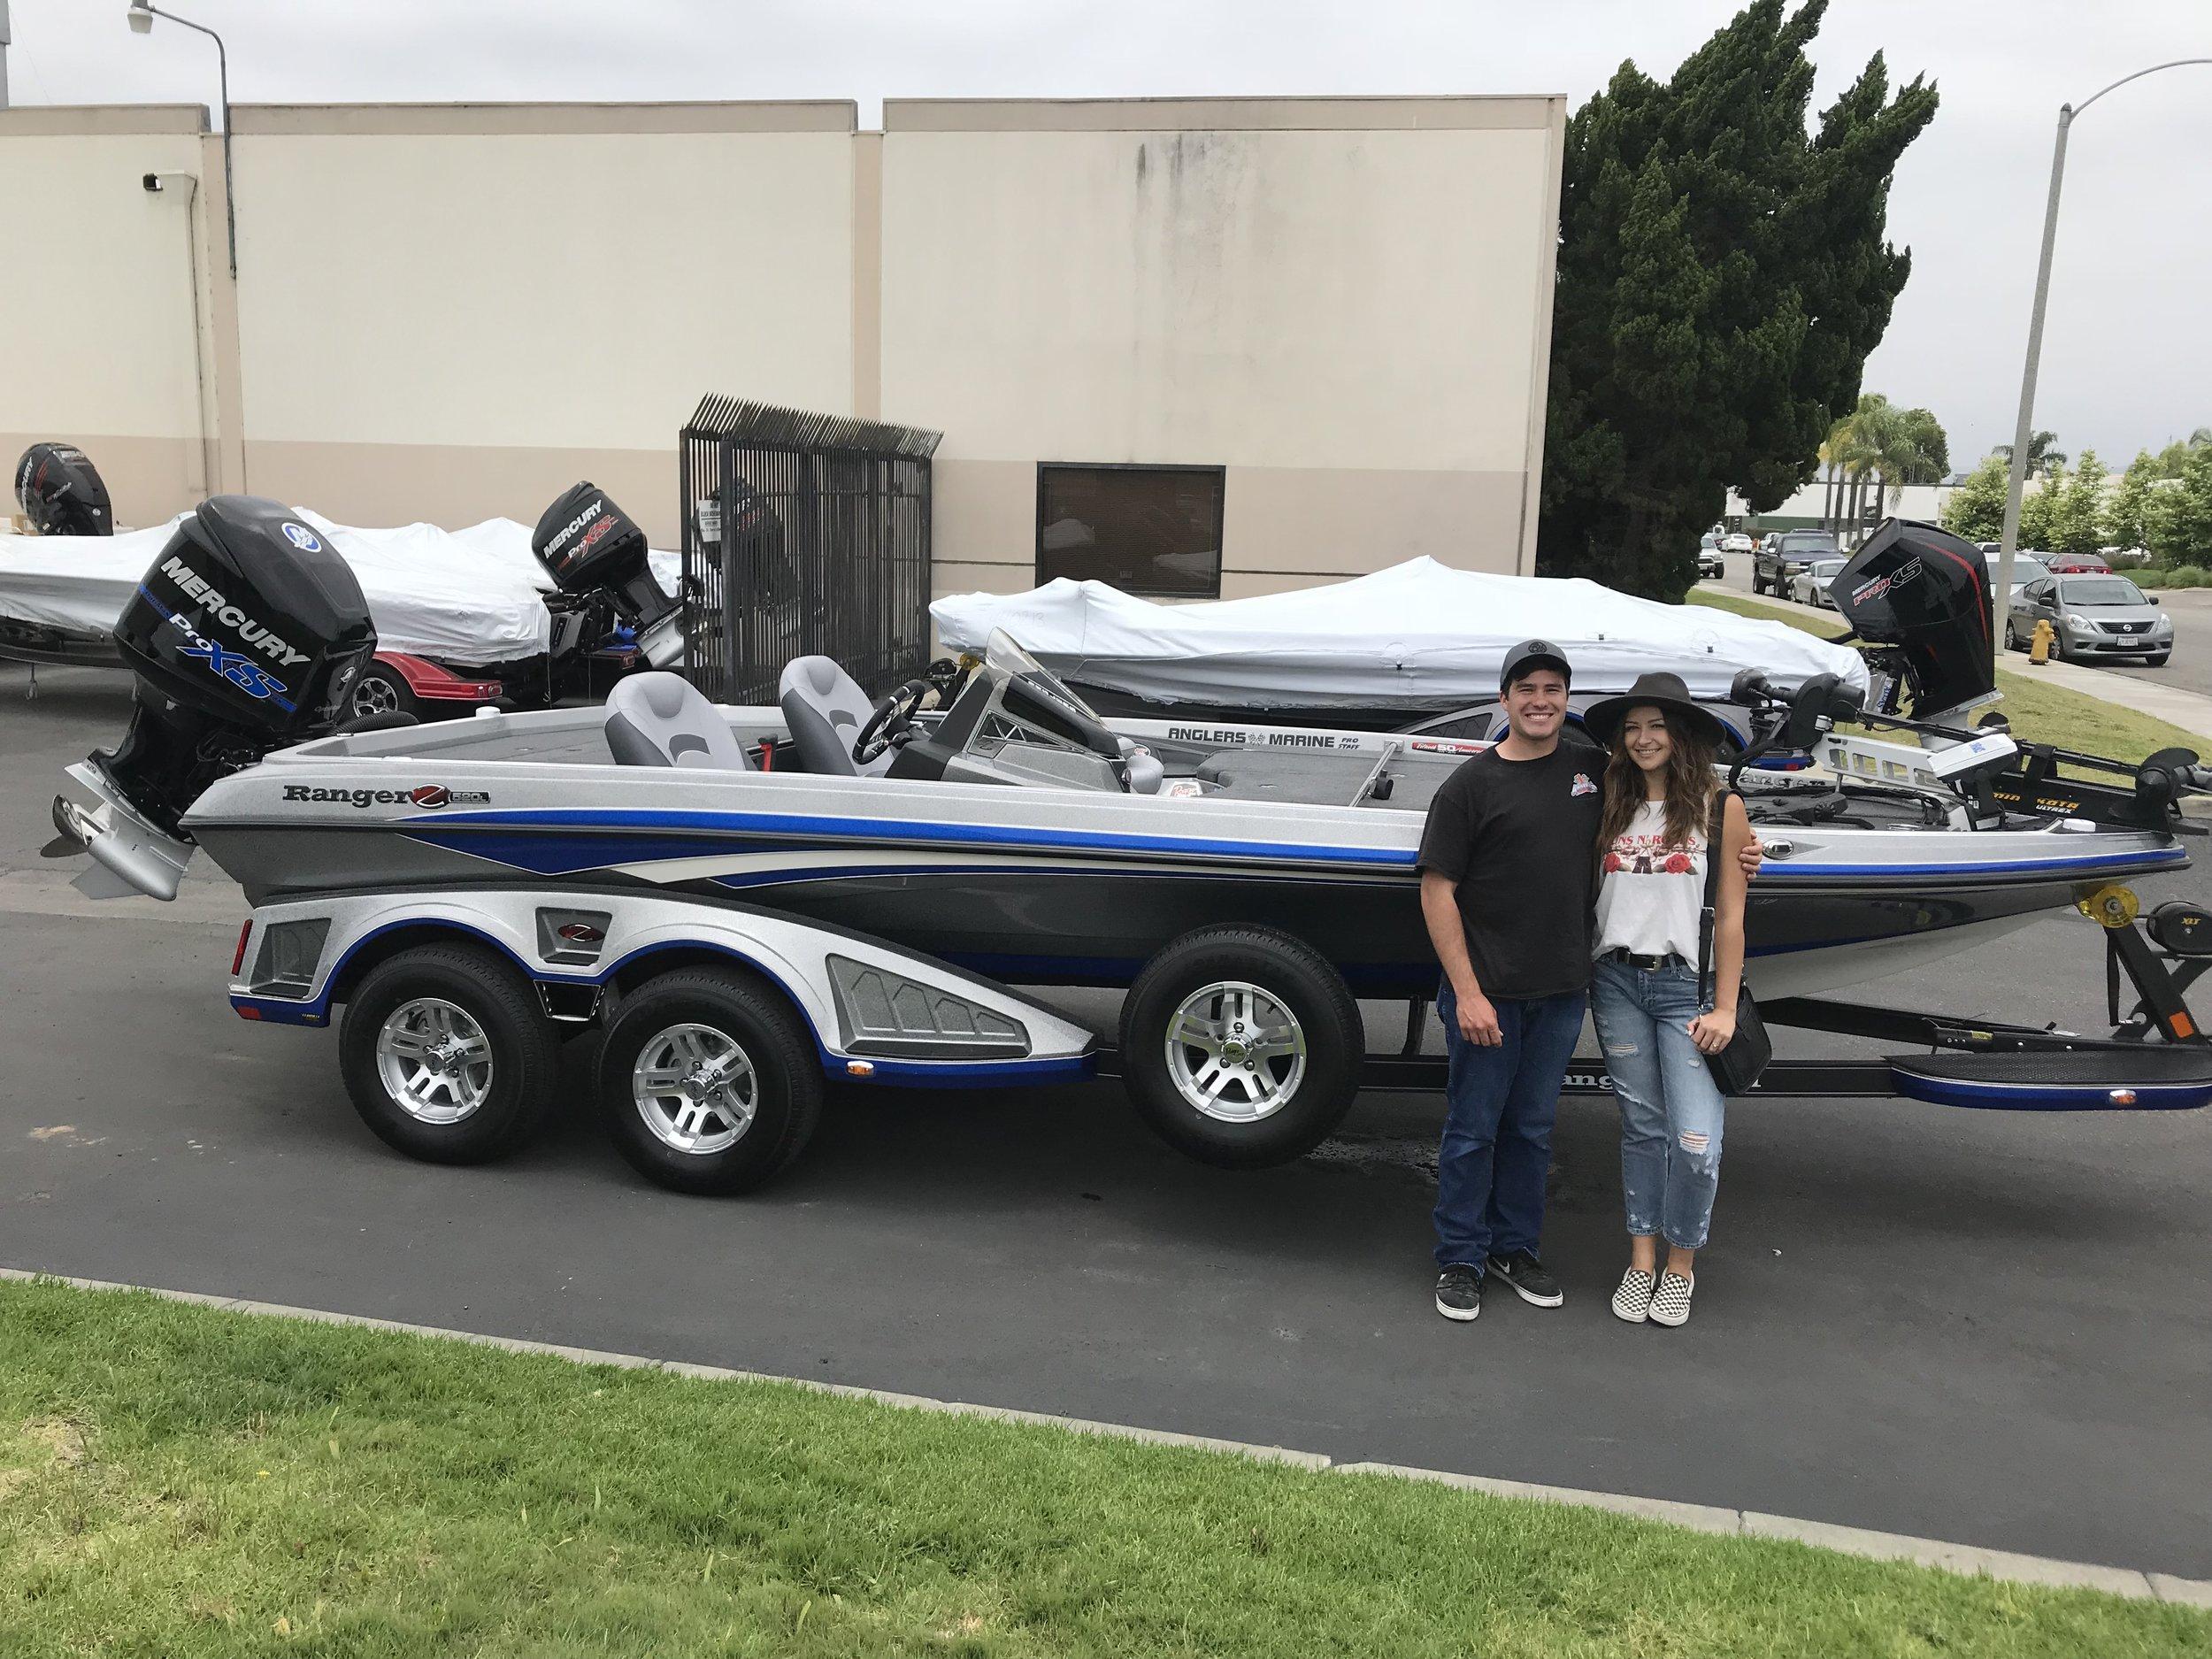 Upcoming Events 2018 - Costa FLW Series California Delta9/27 – 9/29W.O.N Bass U.S. Open Lake Mead 10/15 – 10/17Costa FLW Championship Lake Guntersville, AL 11/1 – 11/3